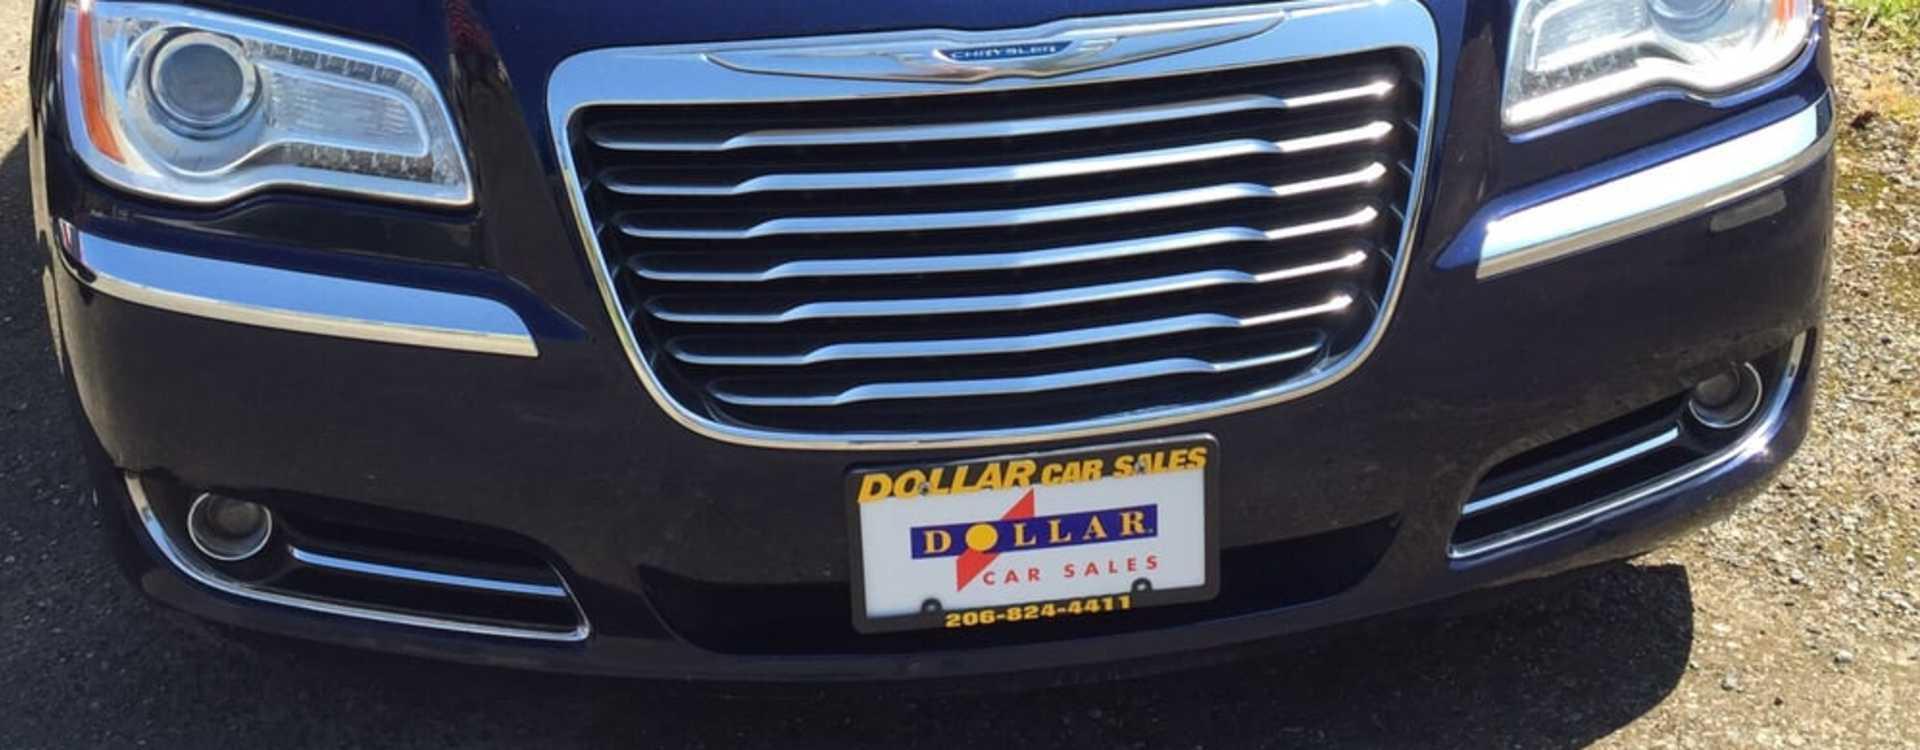 DOLLAR CAR SALES